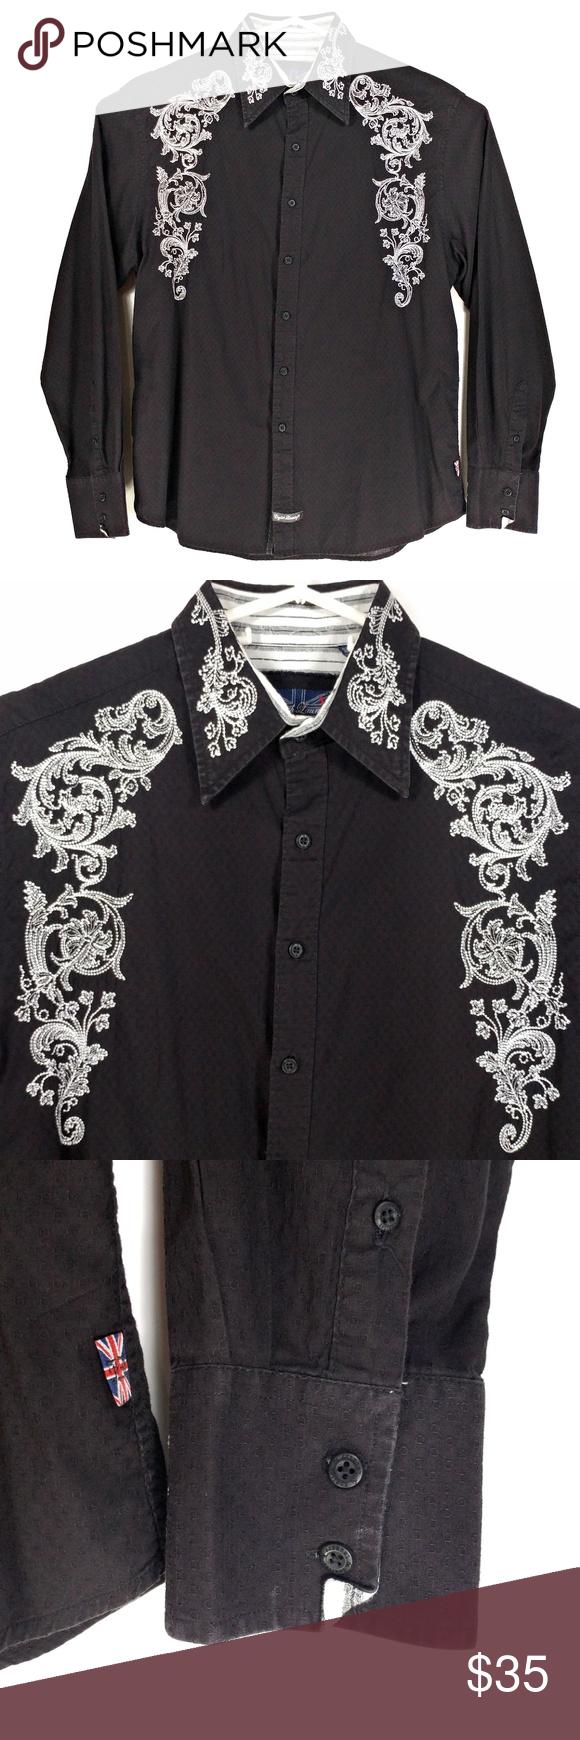 English laundry menus black embroidered shirt lg my posh closet